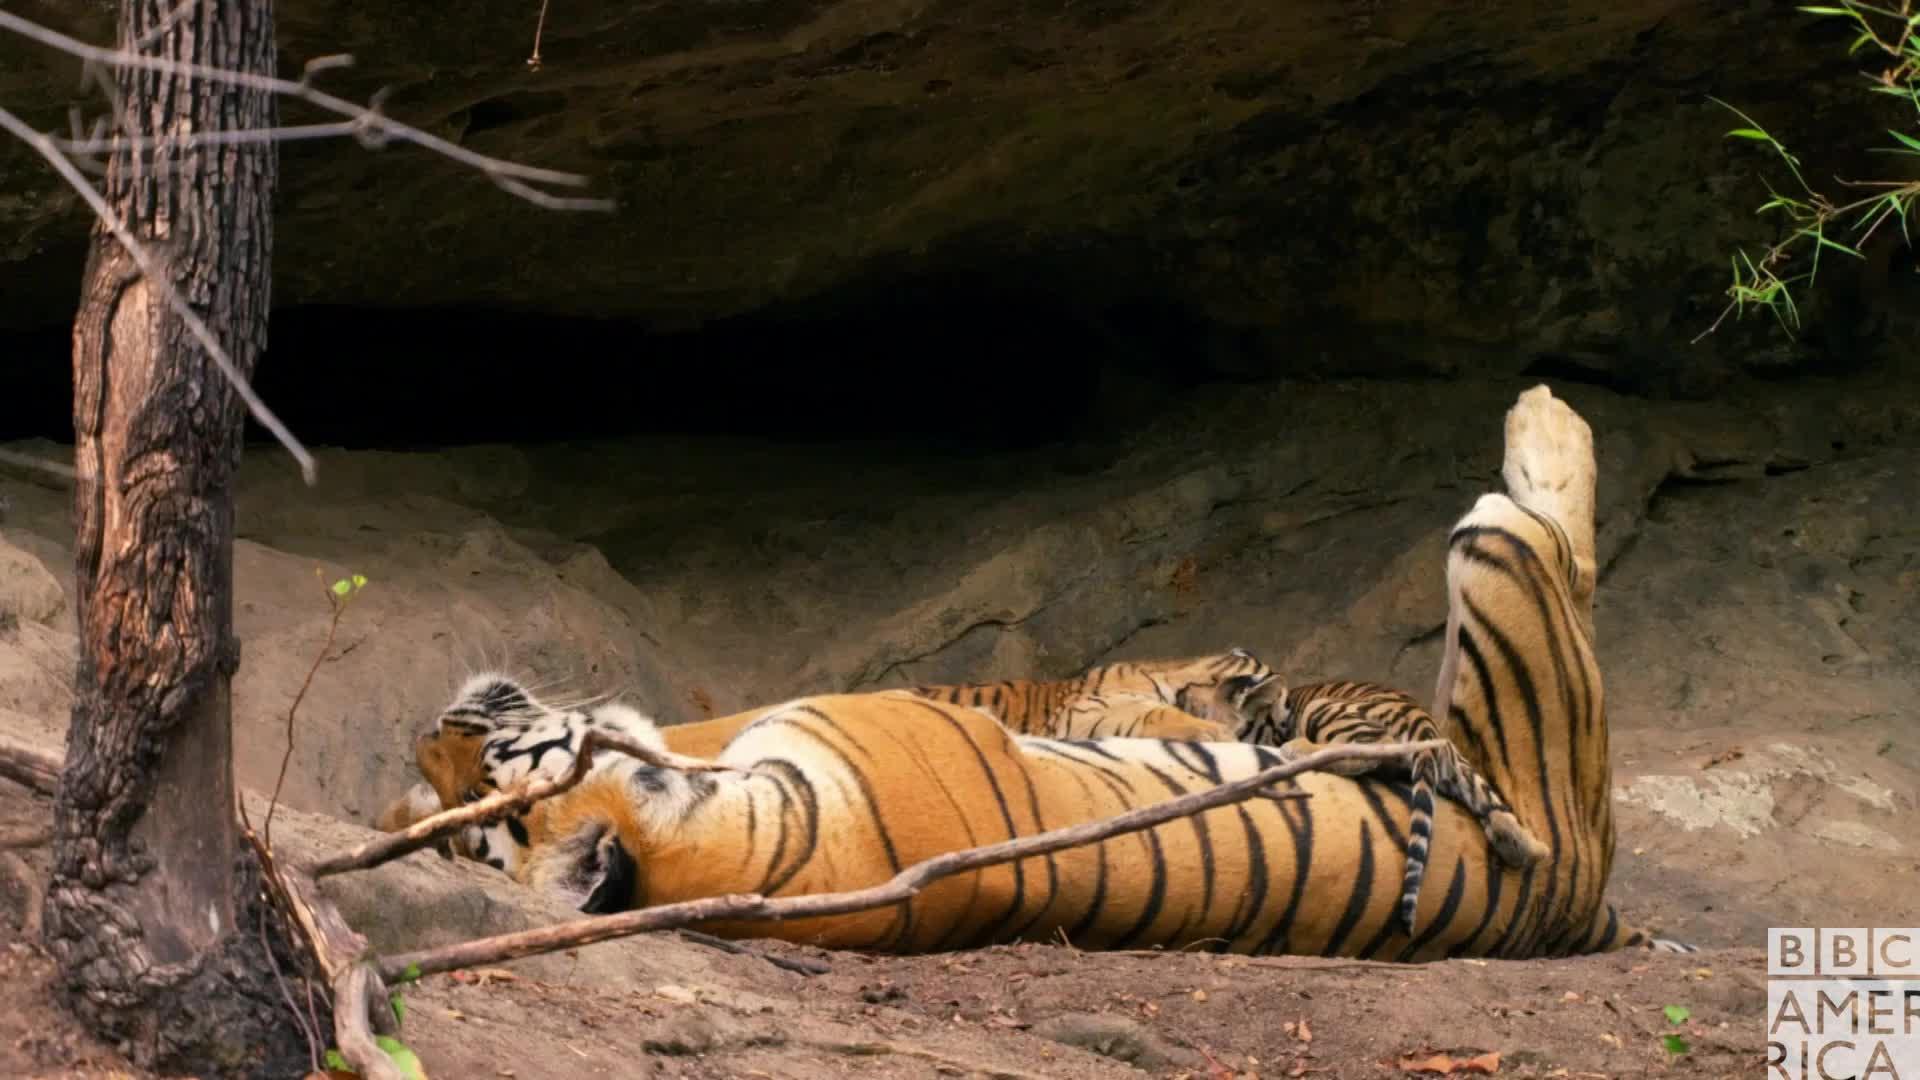 animal, animals, bbc america, bbc america dynasties, bbc america: dynasties, dynasties, thirsty, tiger, tigers, tired, Dynasties Thirsty Tiger Cubs GIFs